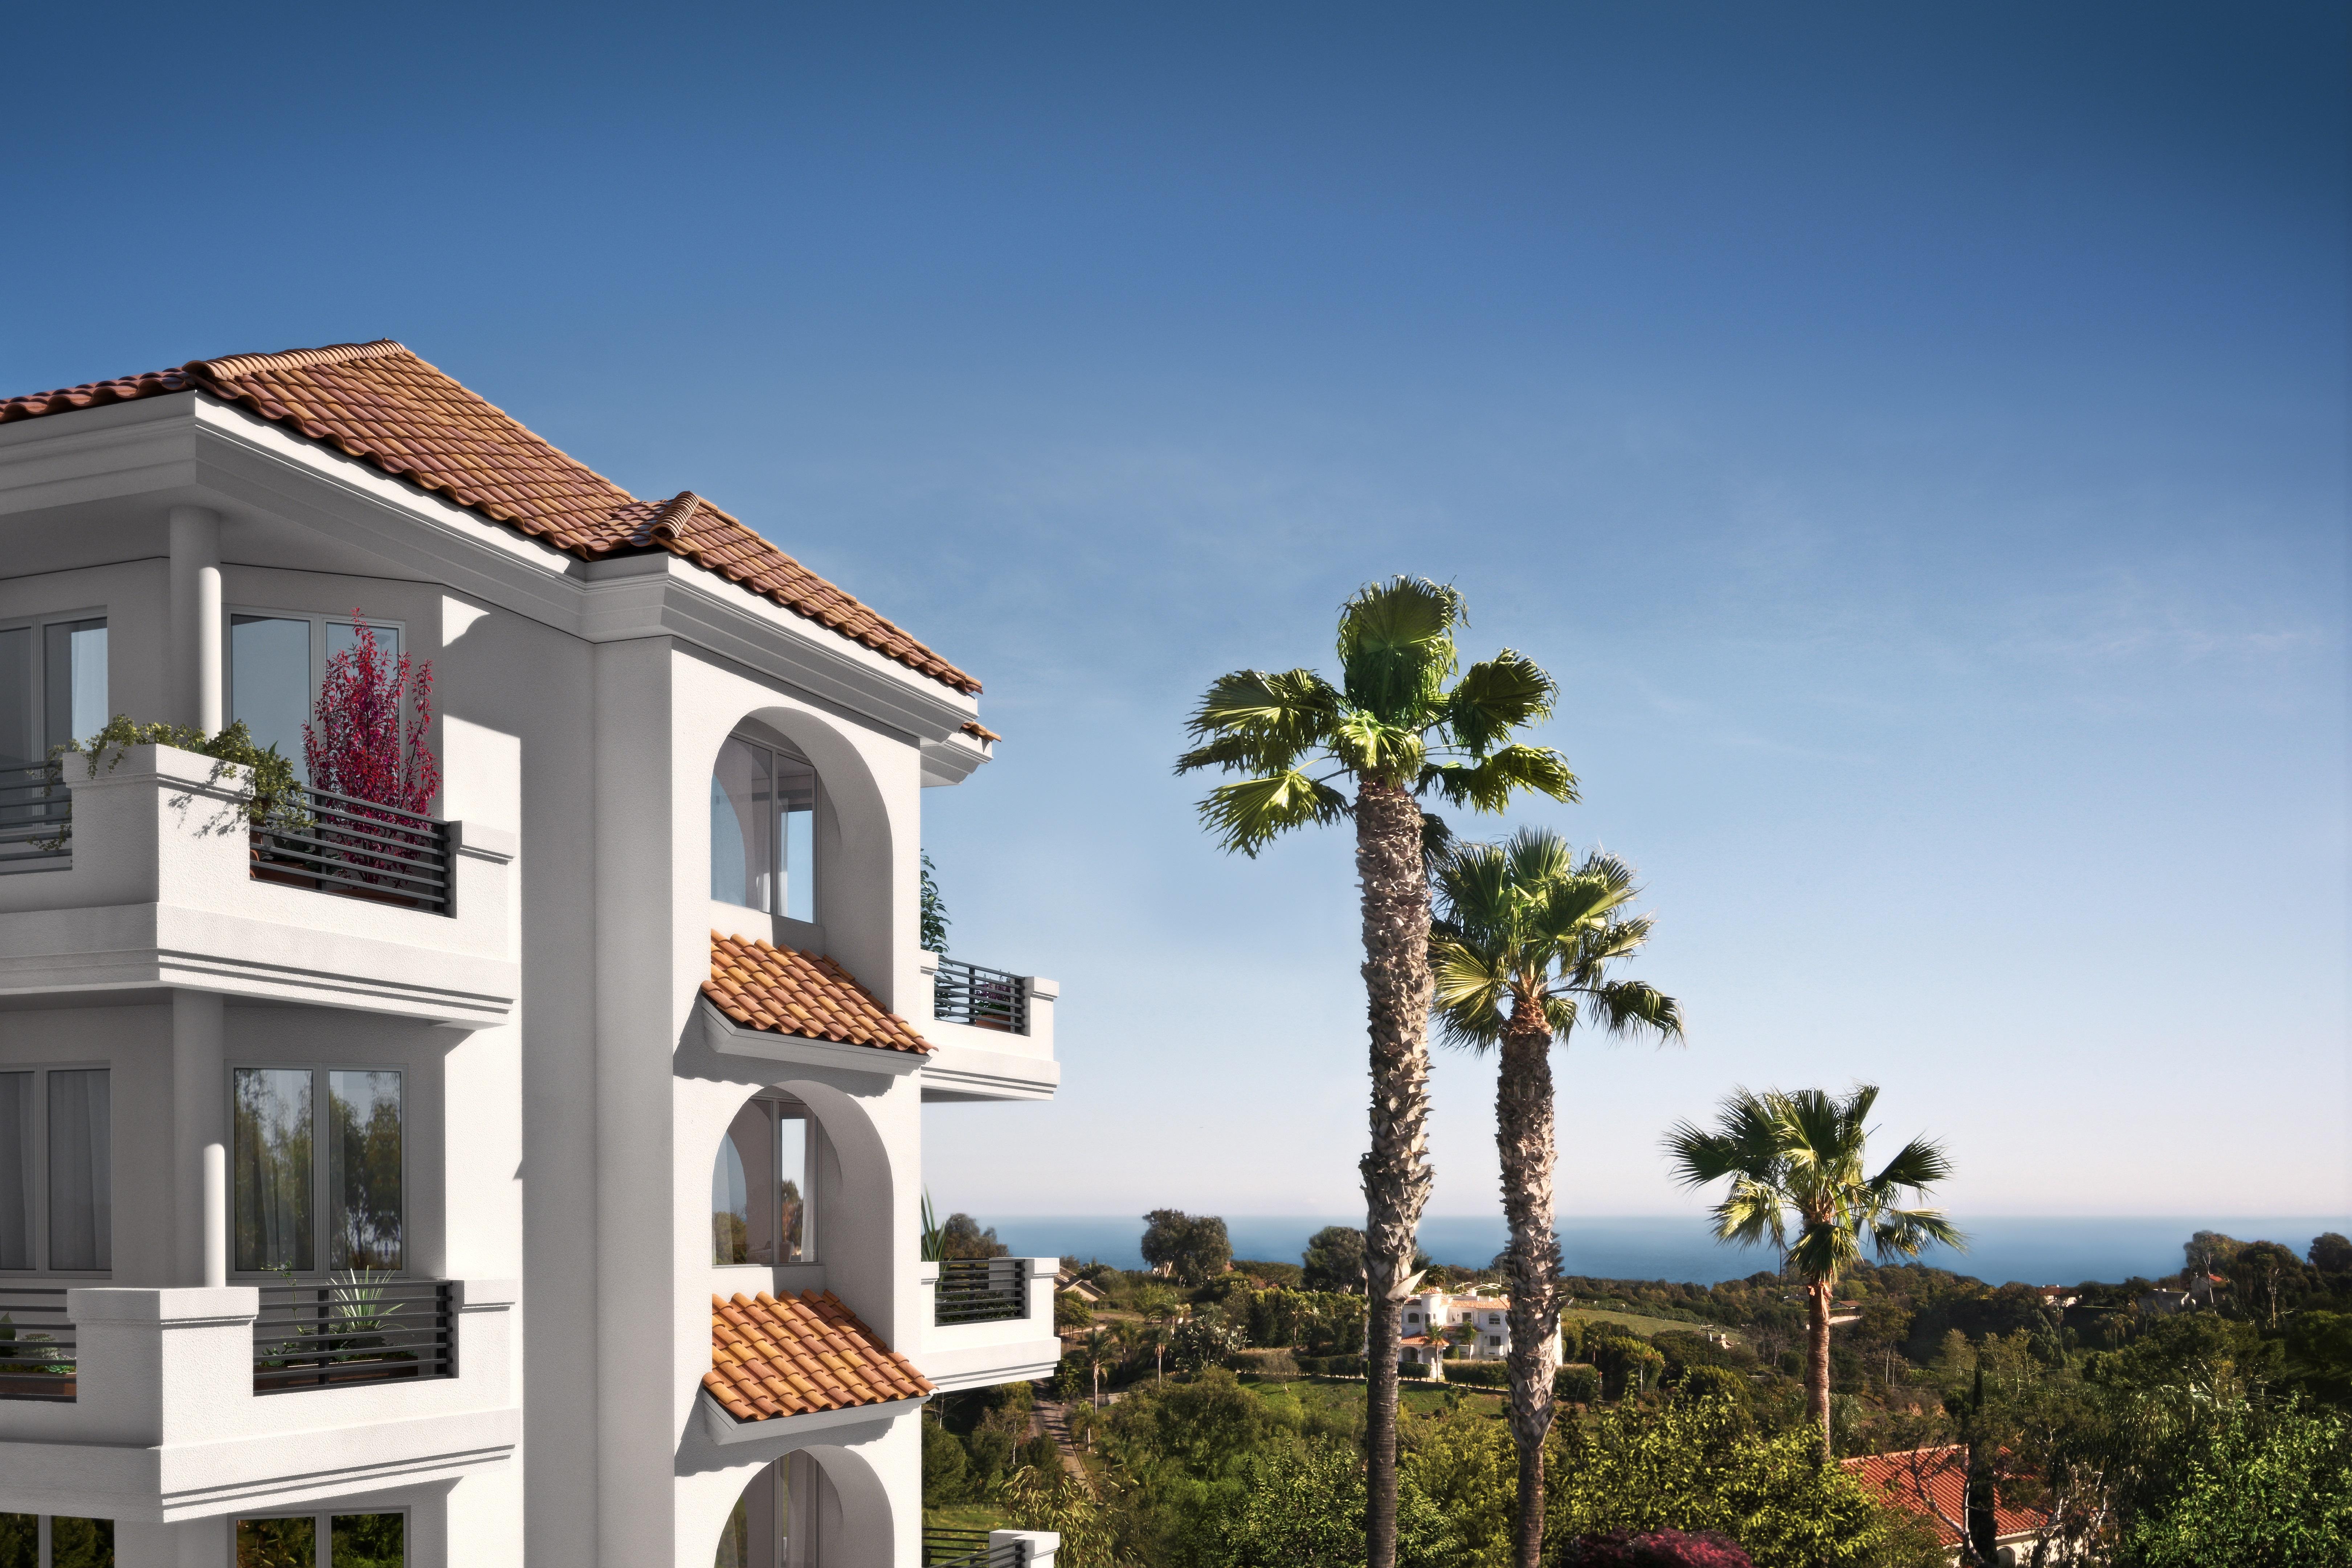 Cavalleri to Usher in Reinvigorated Wave of Malibu Living | Business ...